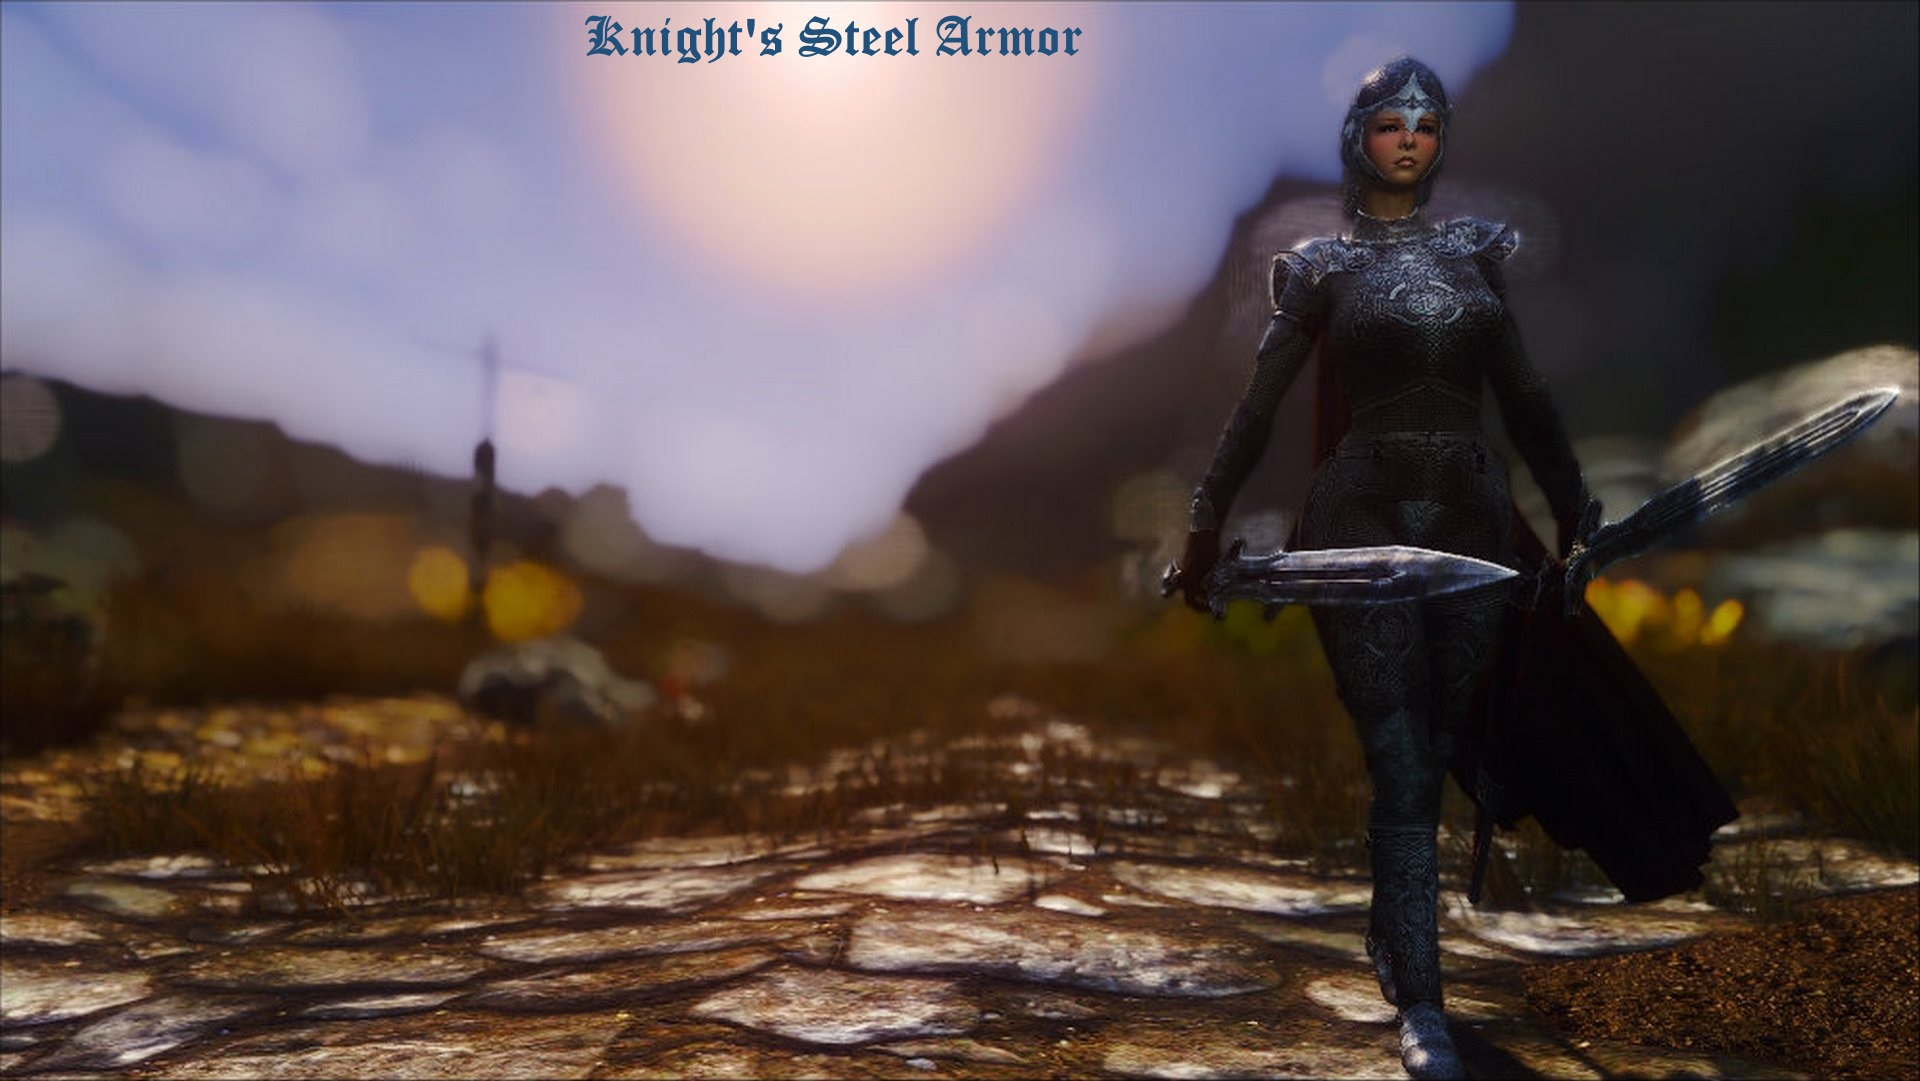 Knight's Steel Armor 01.jpg